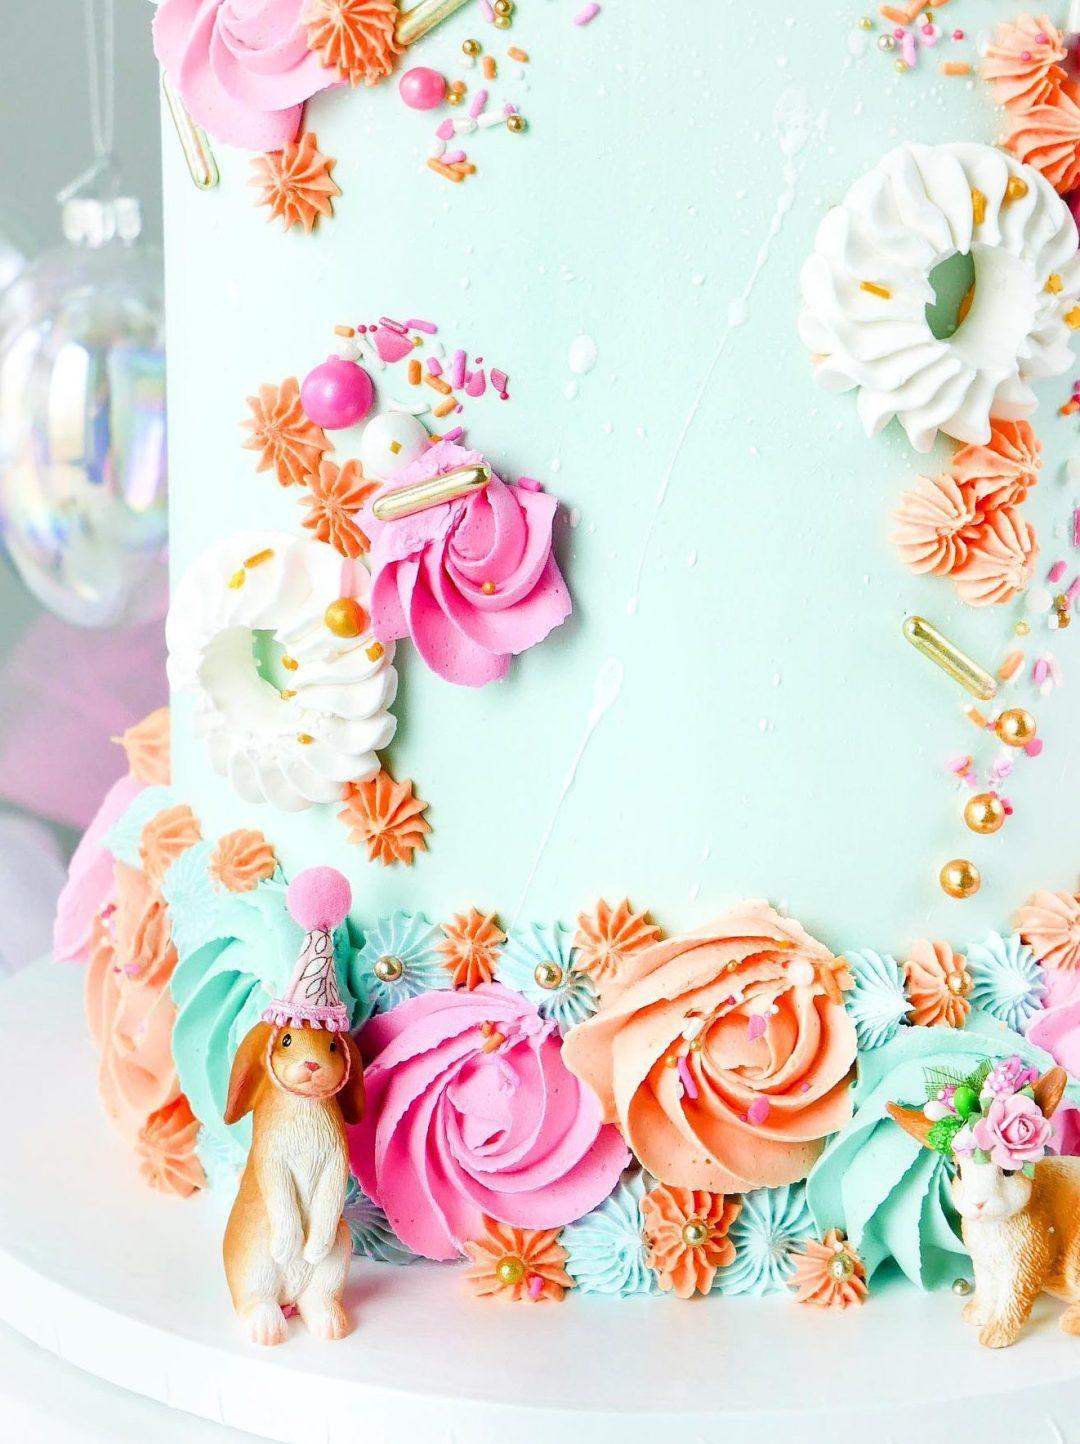 Elegant Easter Pastel Cake With Meringue